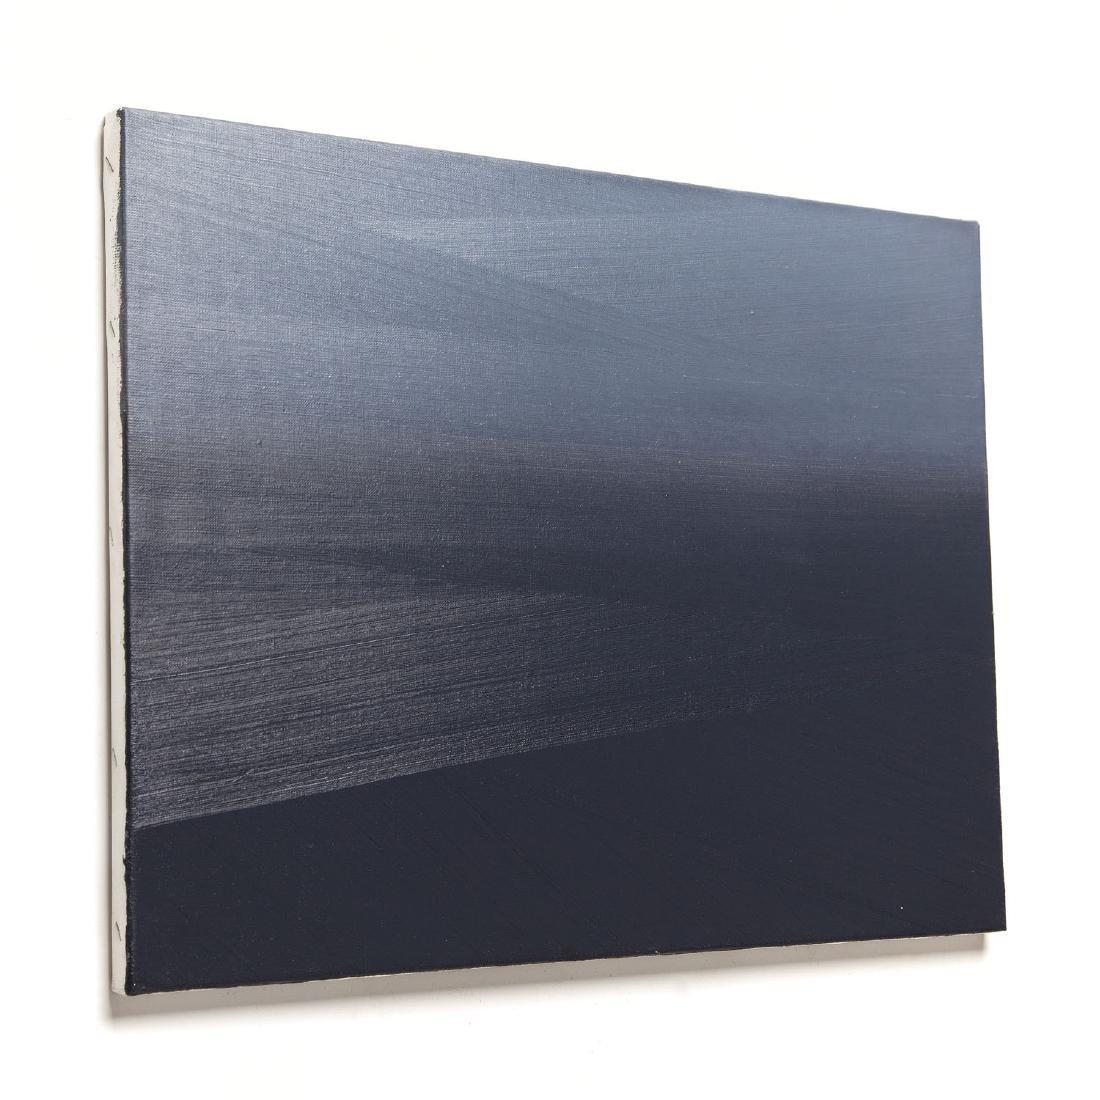 Rafal  Bujnowski (b. 1974) Untitled, 2012 - 4